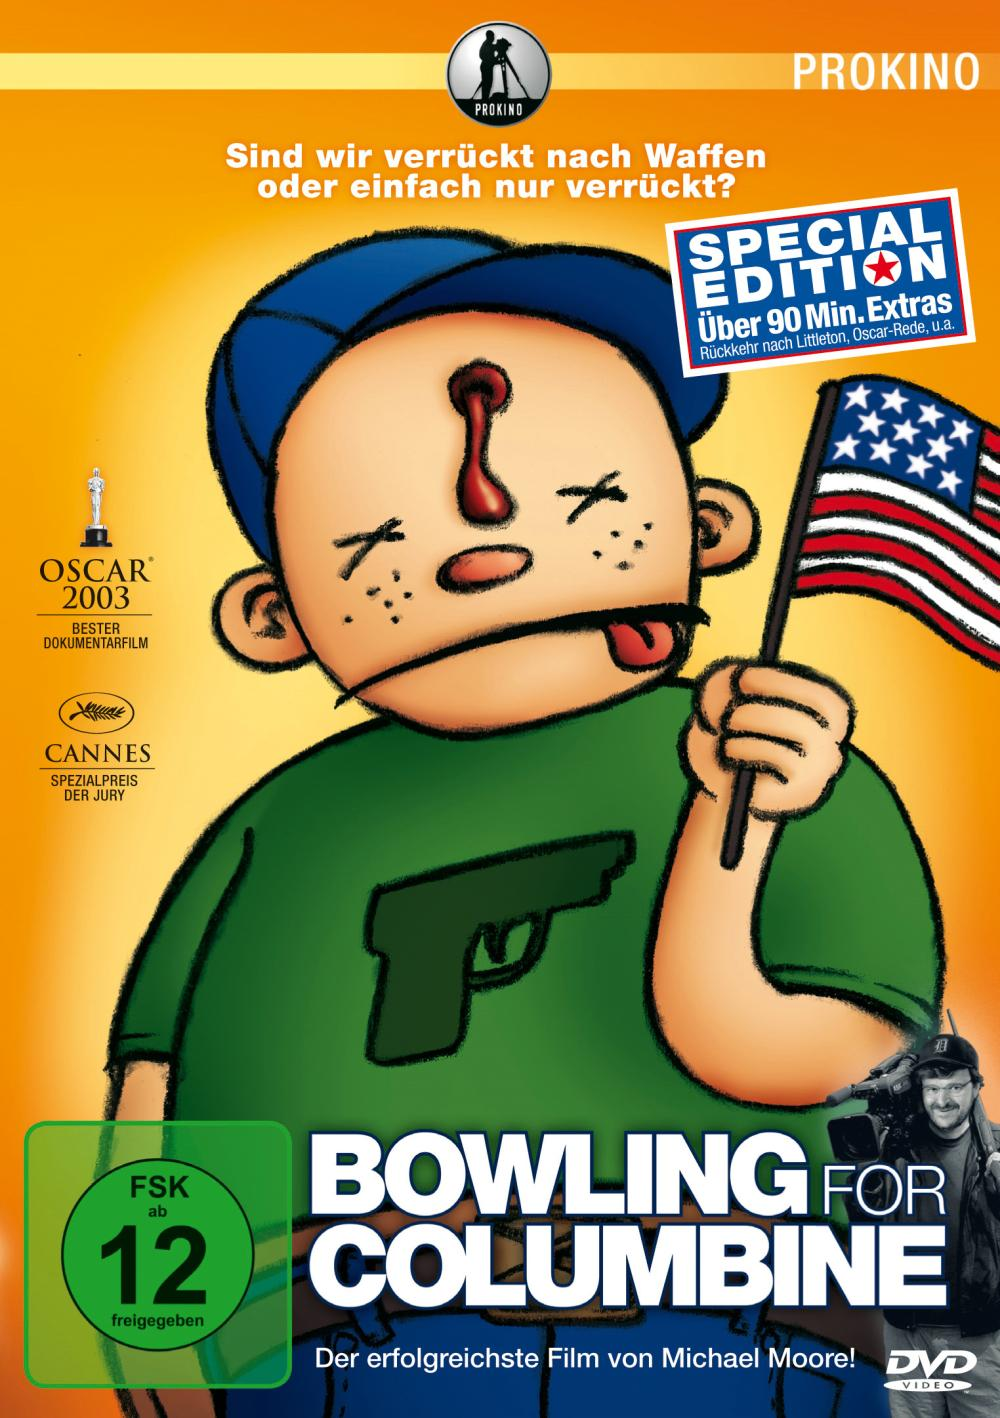 use editing bowling columbine